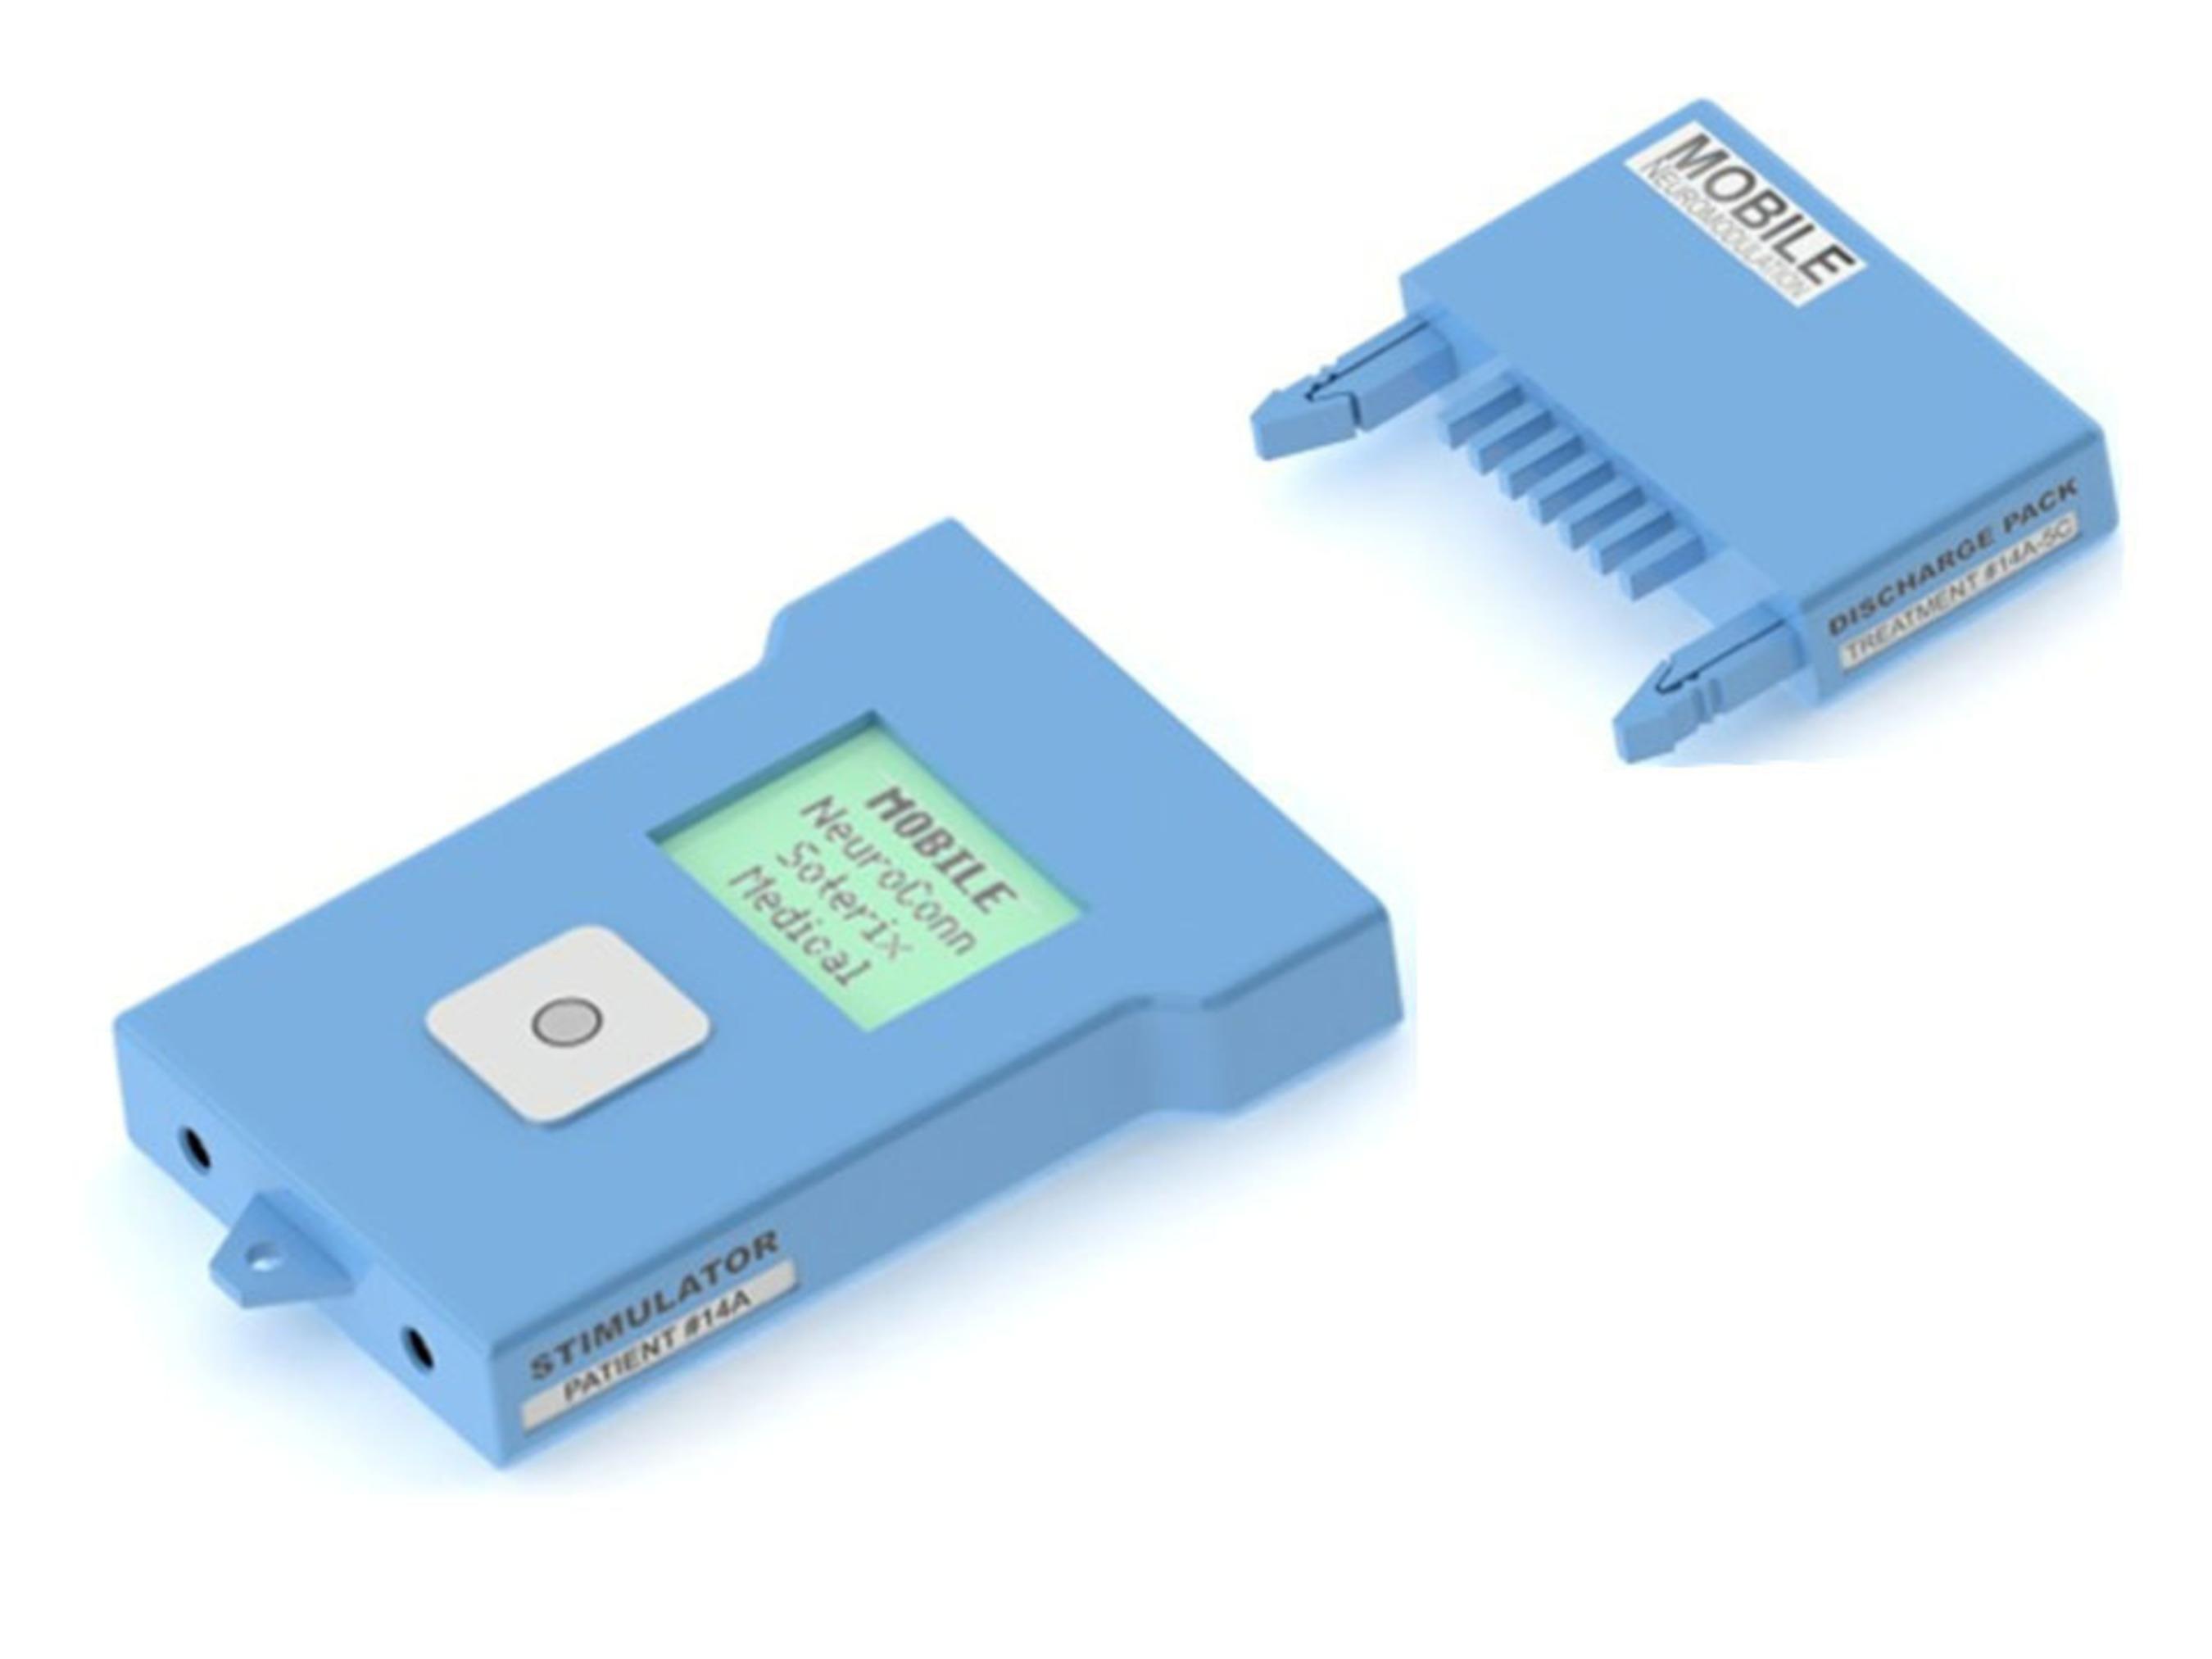 MOBILE neuromodulation stimulator and storage module. (PRNewsFoto/Soterix Medical Inc.) (PRNewsFoto/SOTERIX MEDICAL INC.)